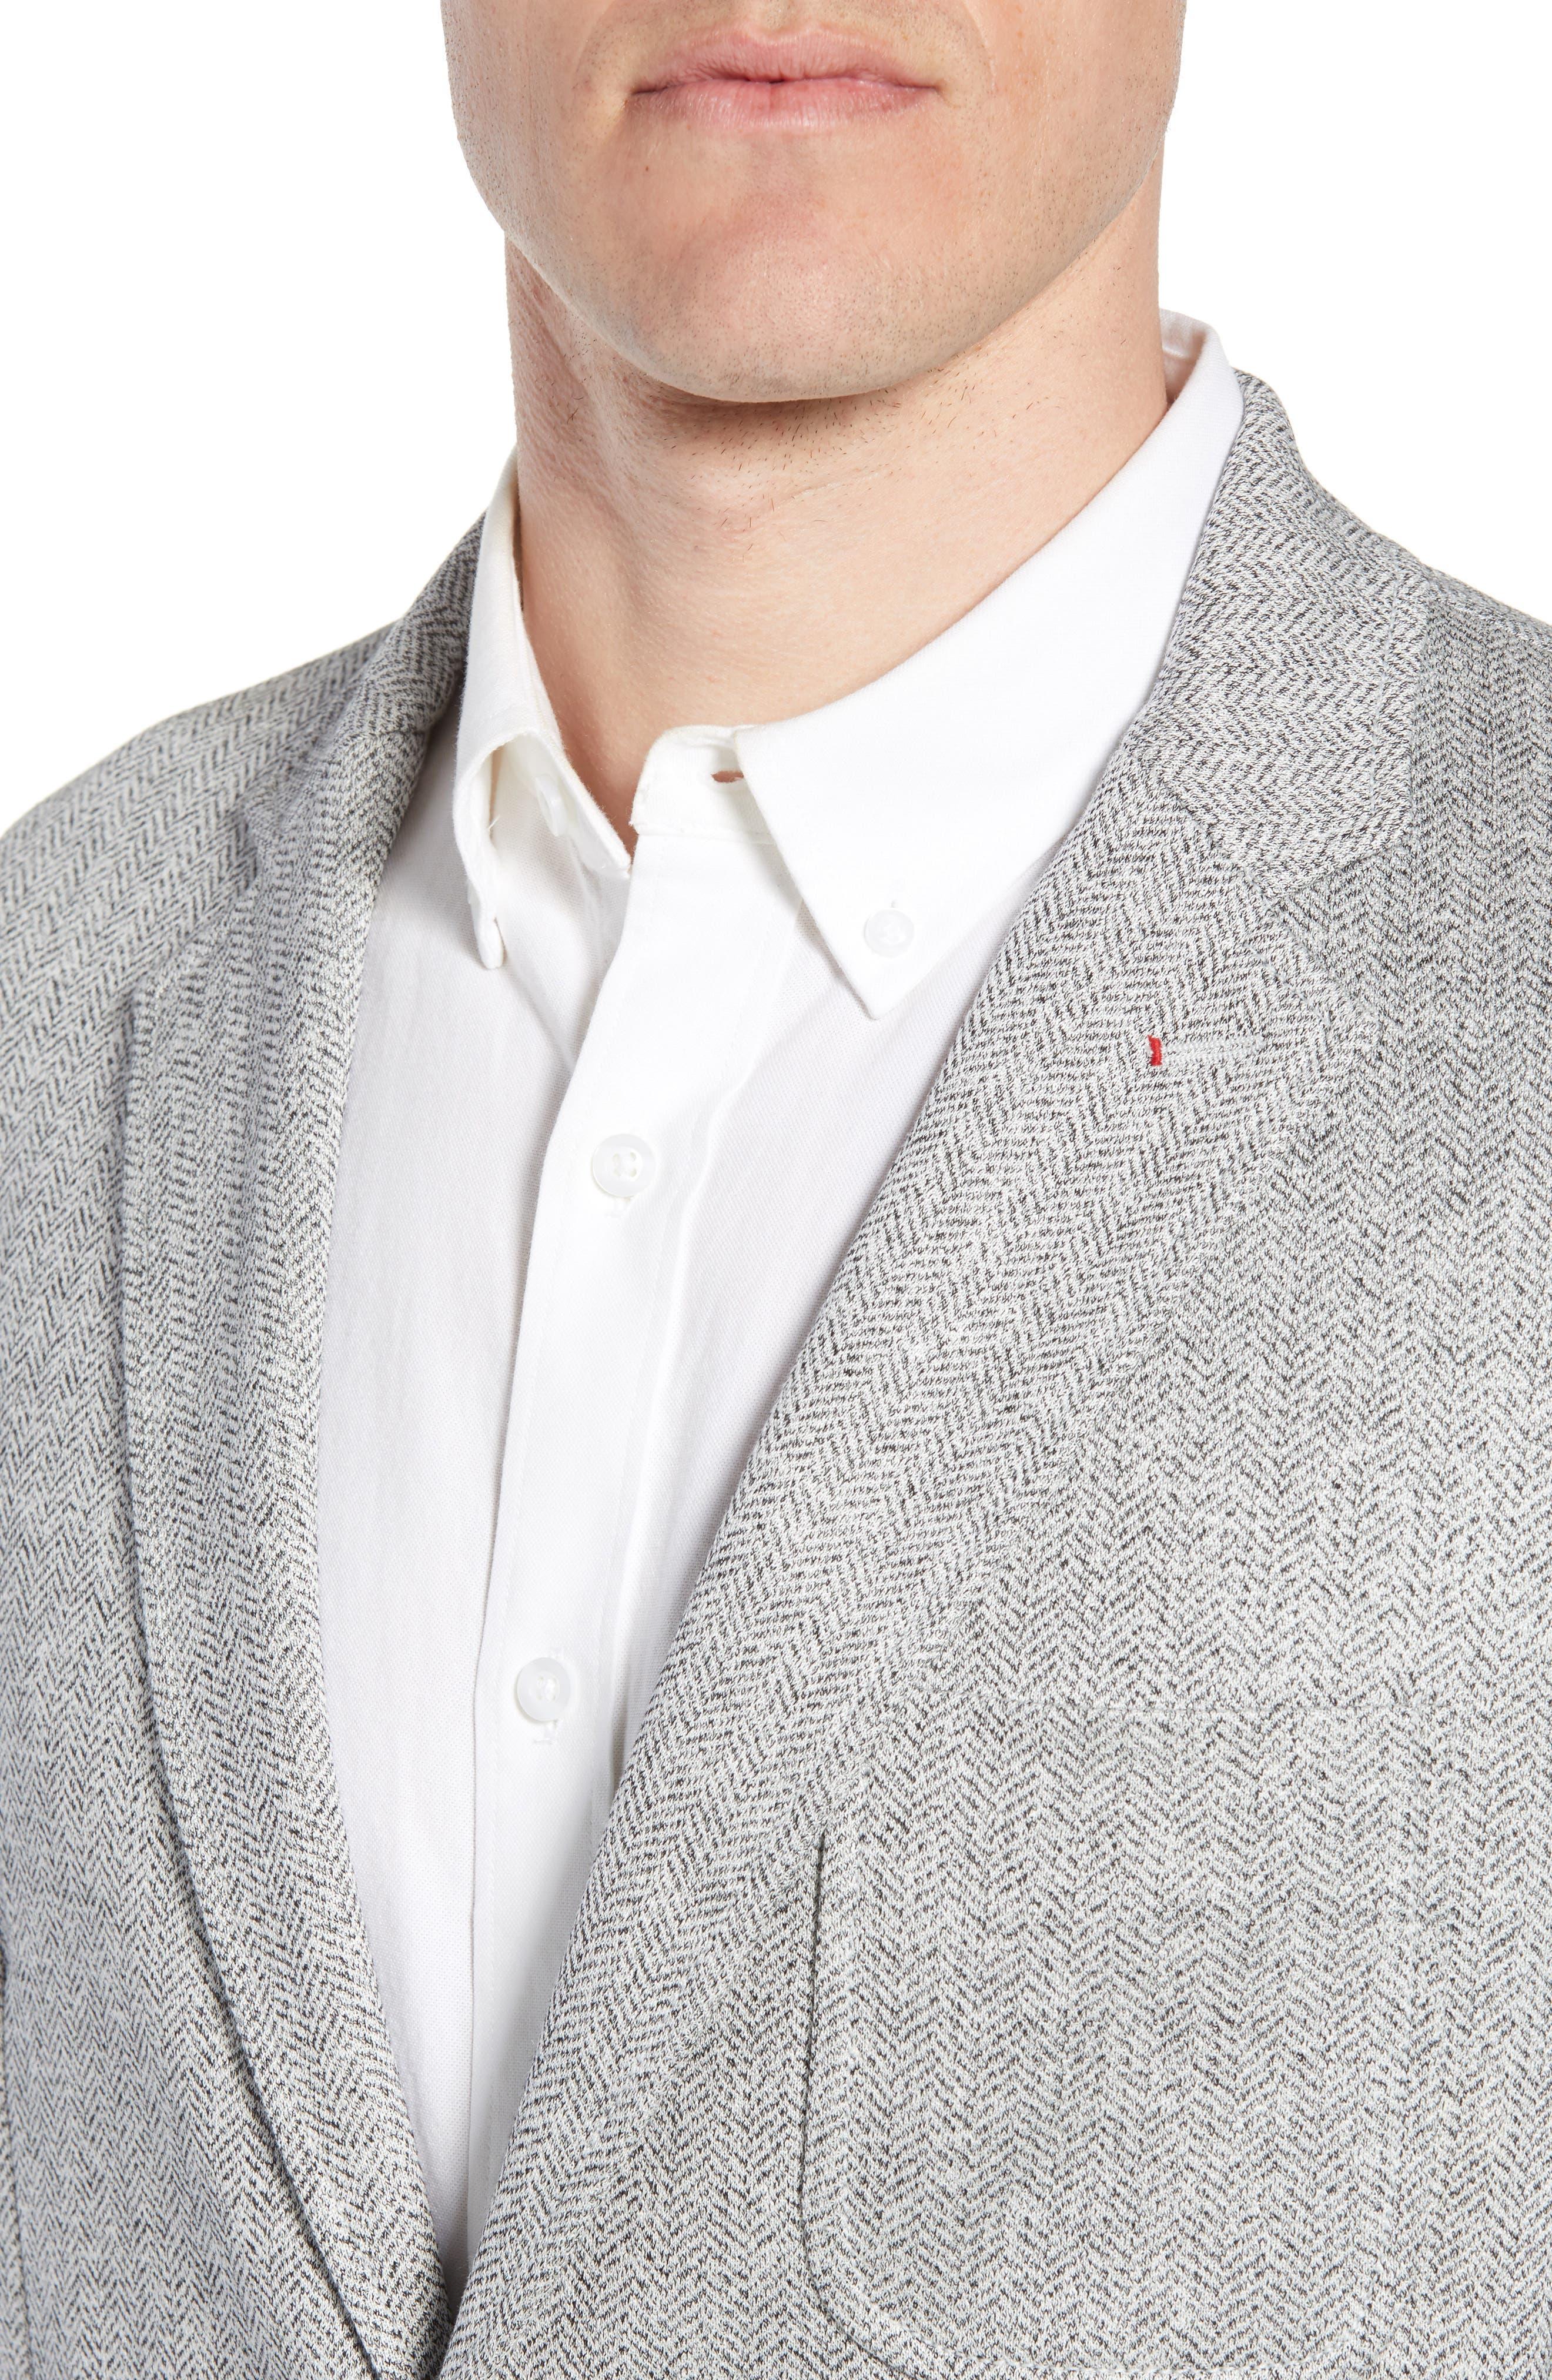 Regular Fit Herringbone Cotton & Linen Blazer,                             Alternate thumbnail 4, color,                             040